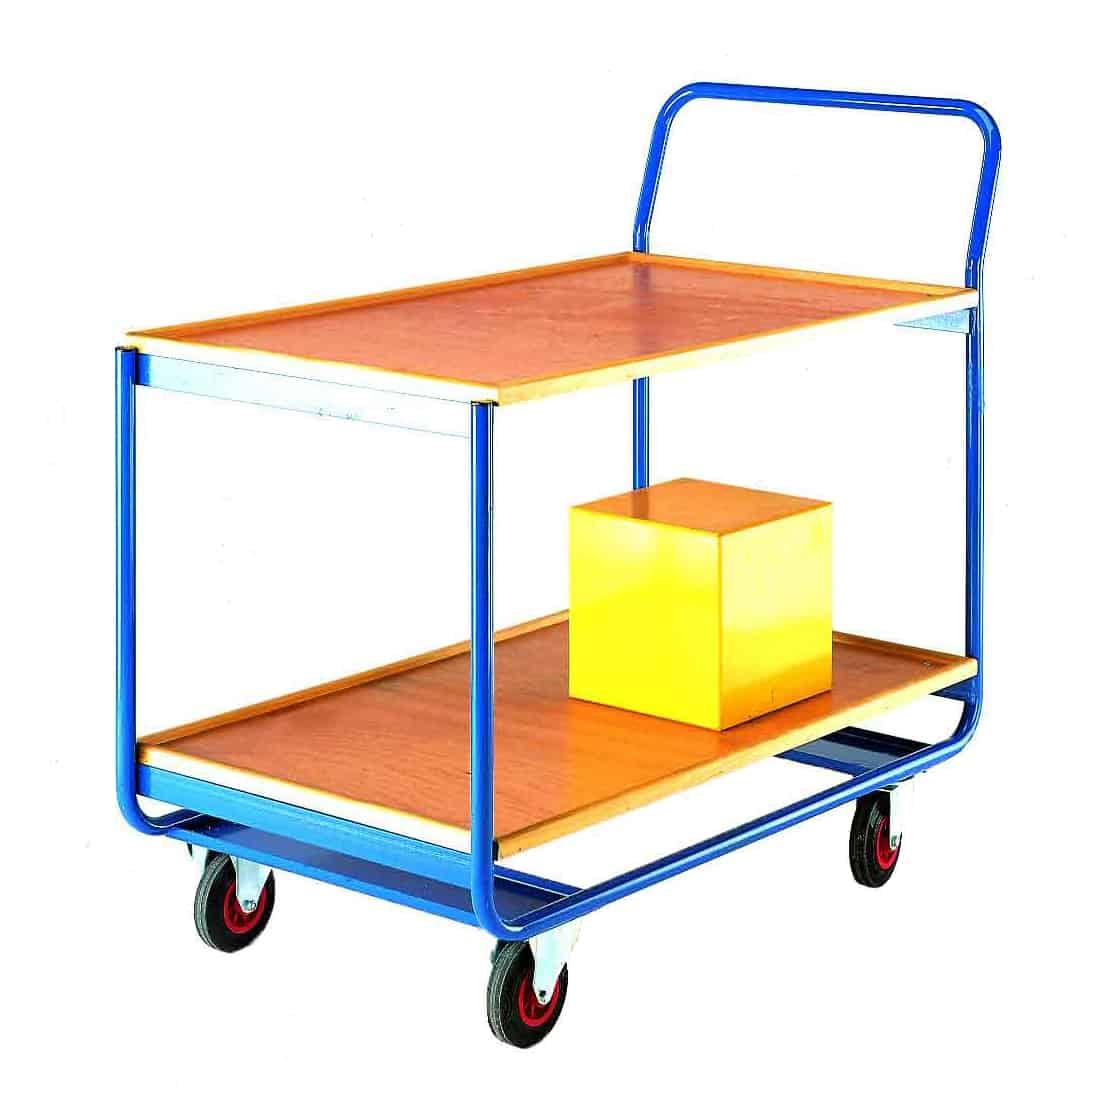 TT160 Series Plywood Shelf Workshop Trolleys